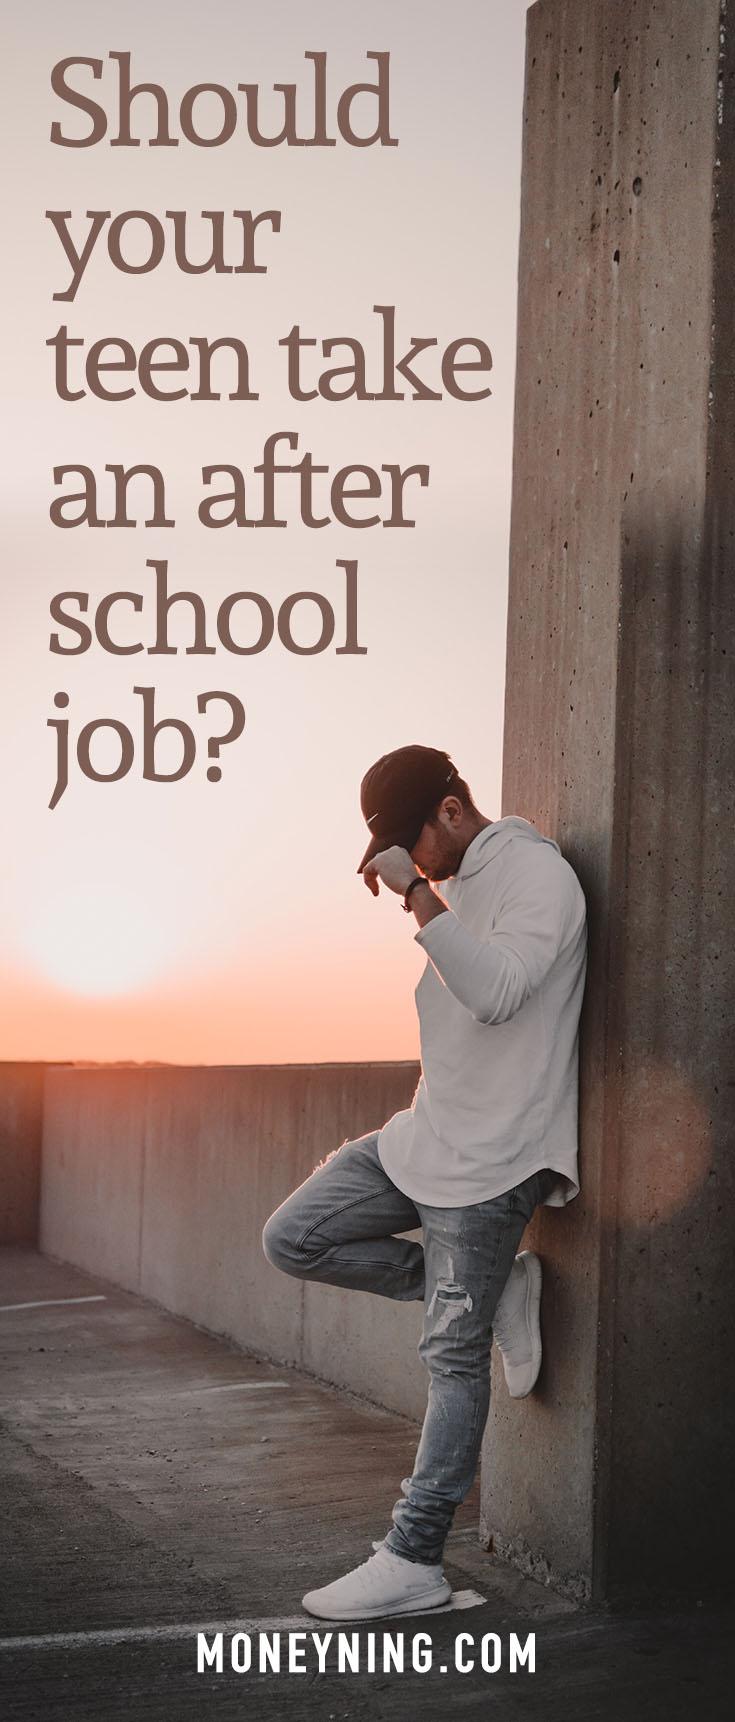 after school job